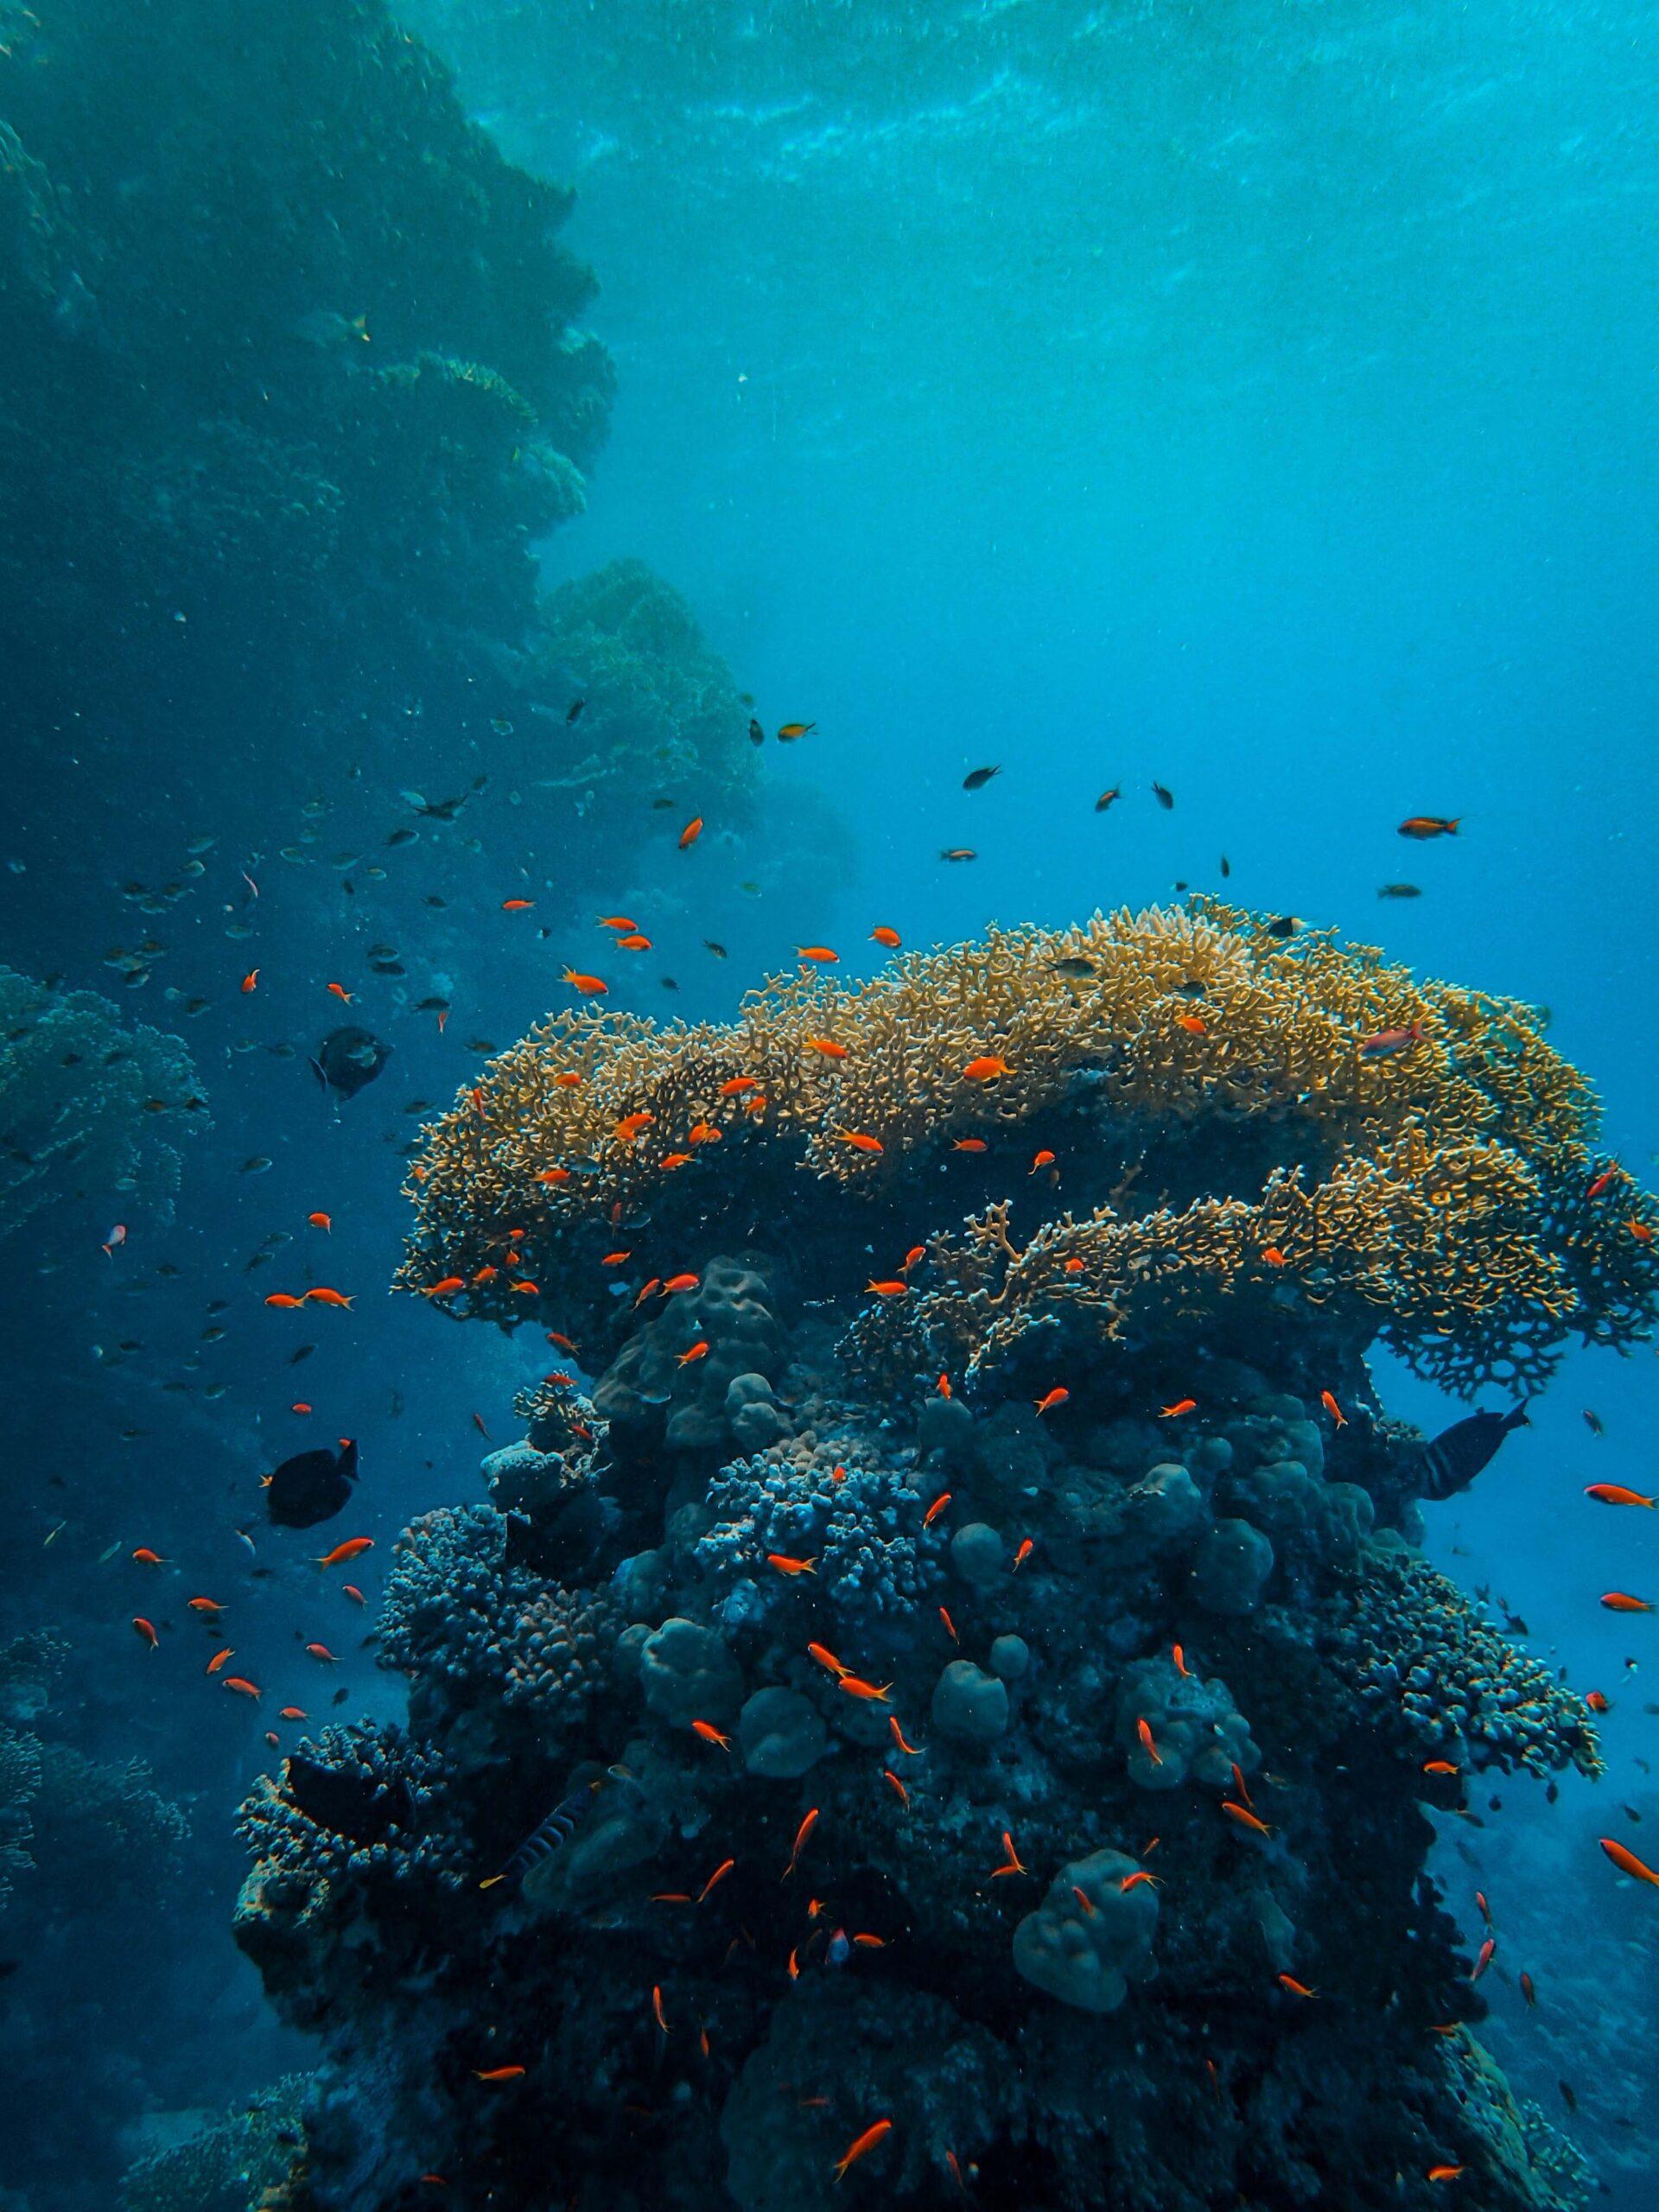 Giant clams share symbiotic algae with corals via poop